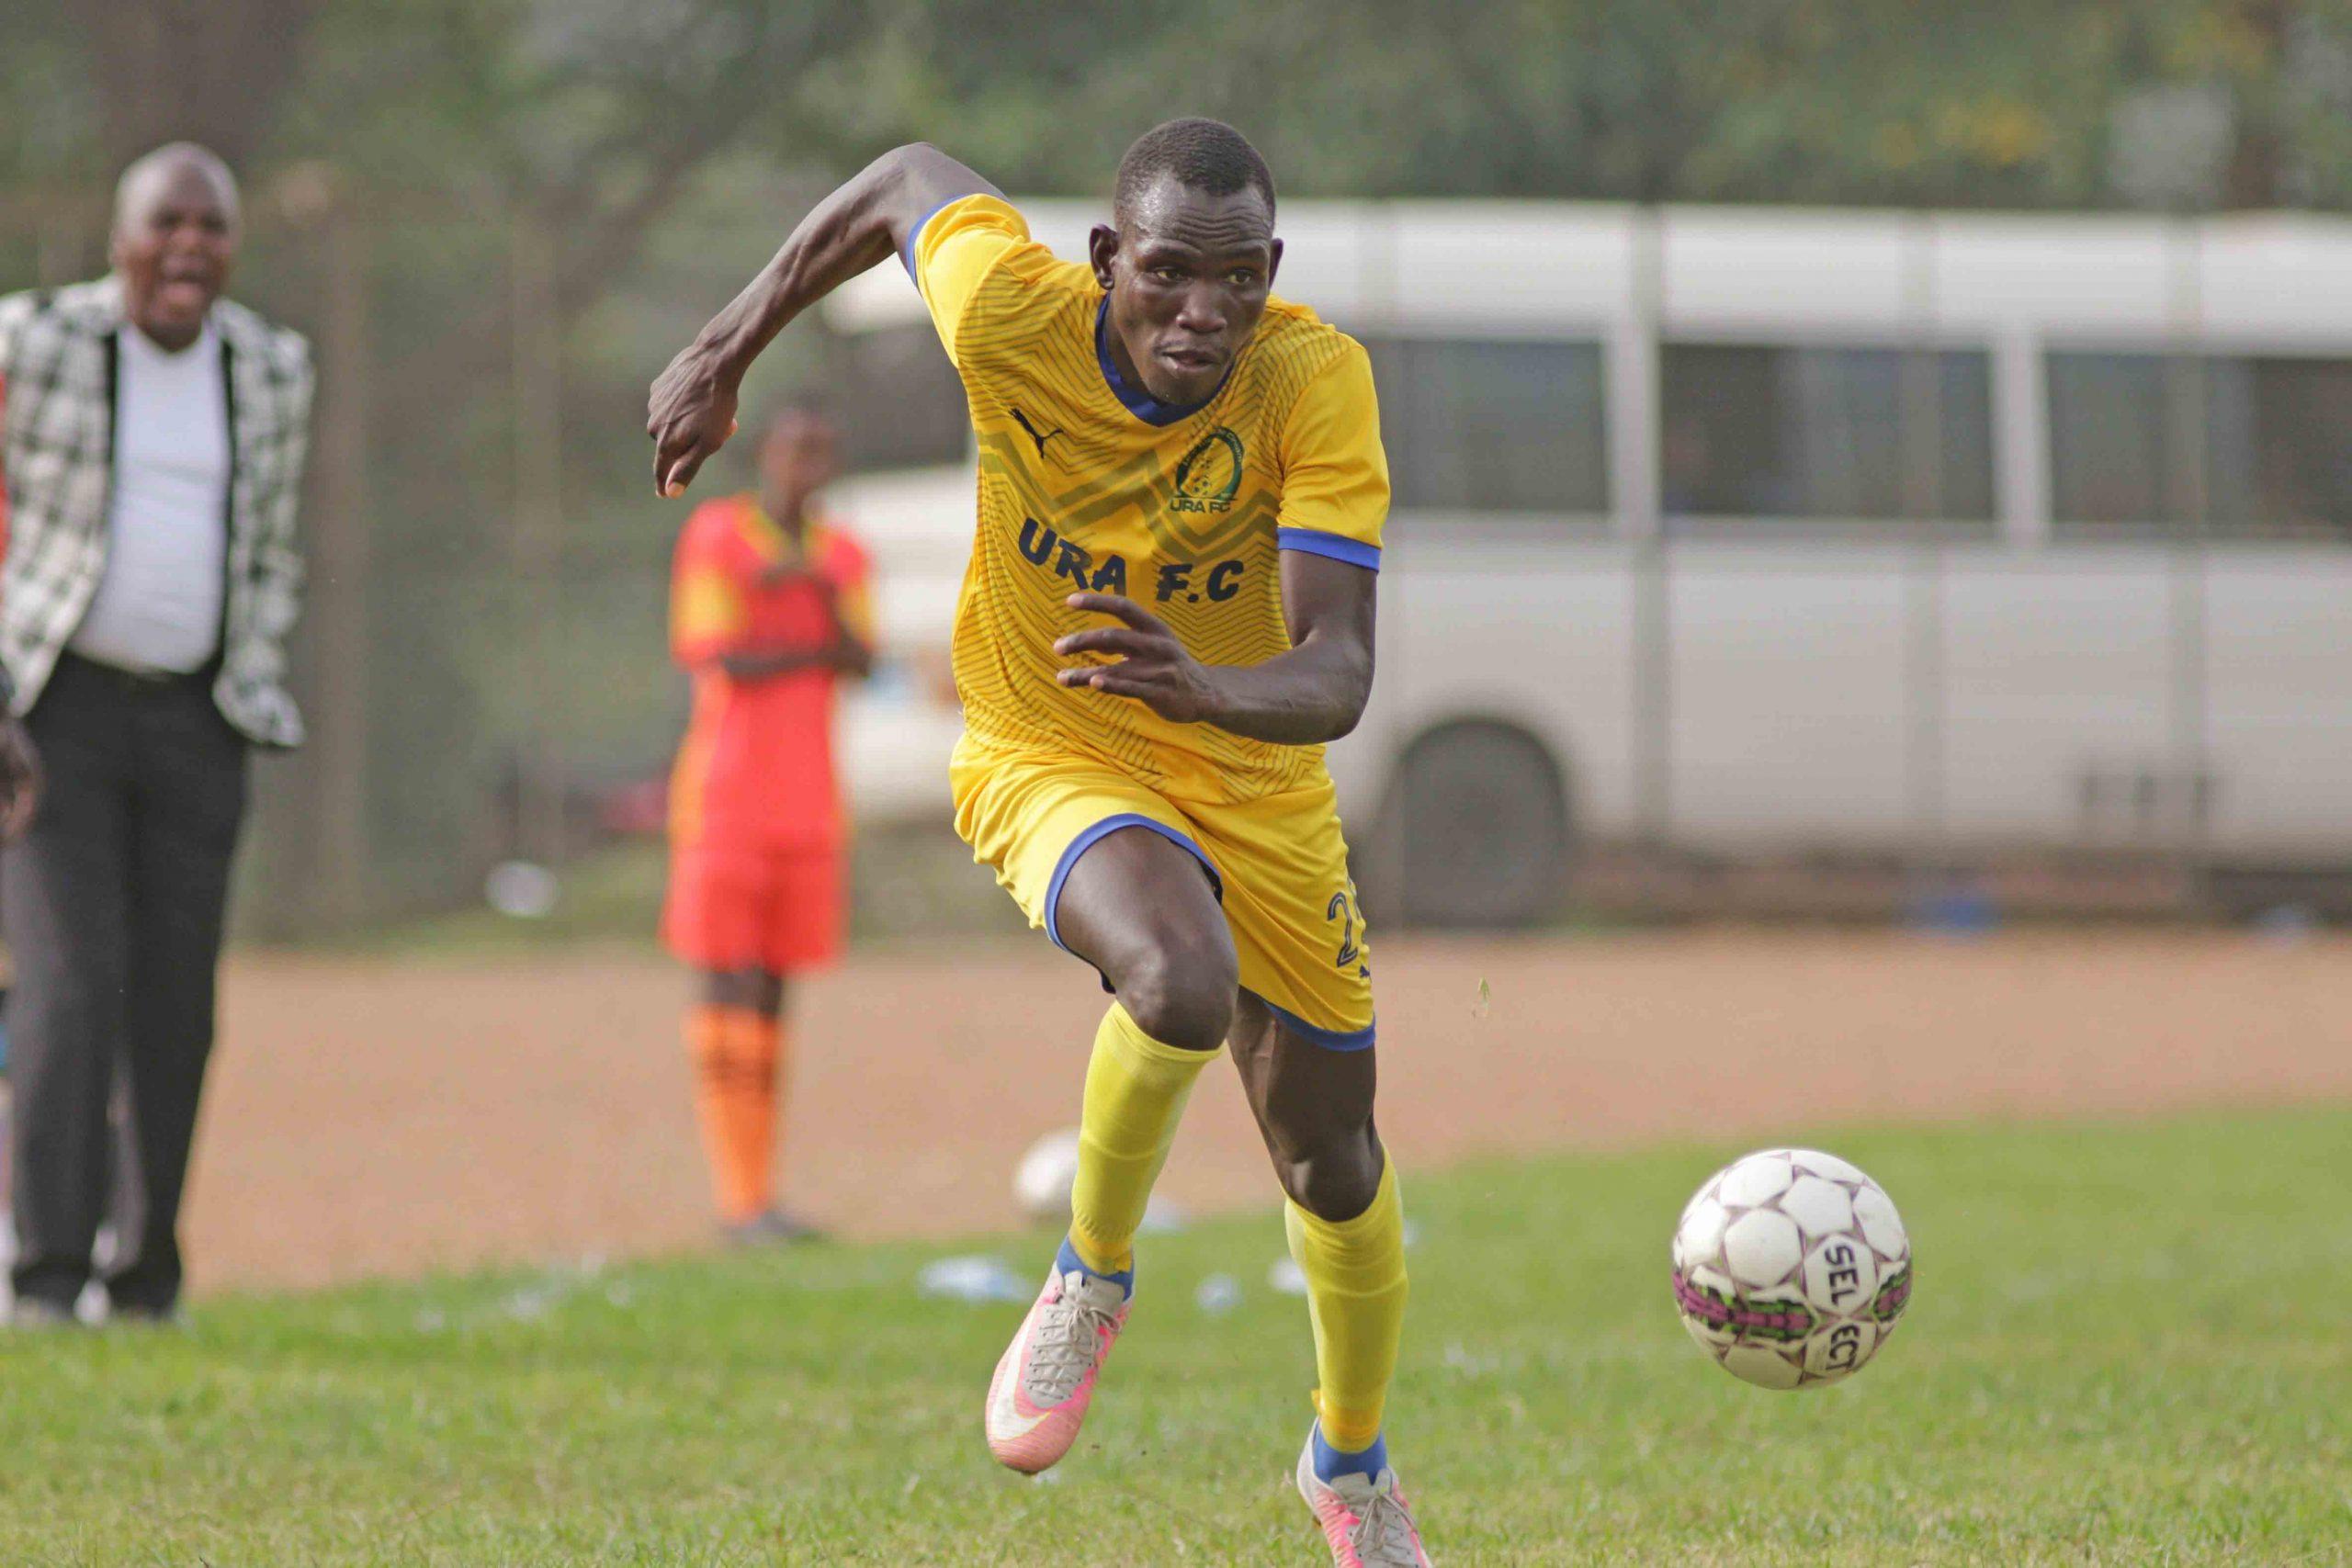 MATCH REPORT: URA FC 0 WAKISO GIANTS 0